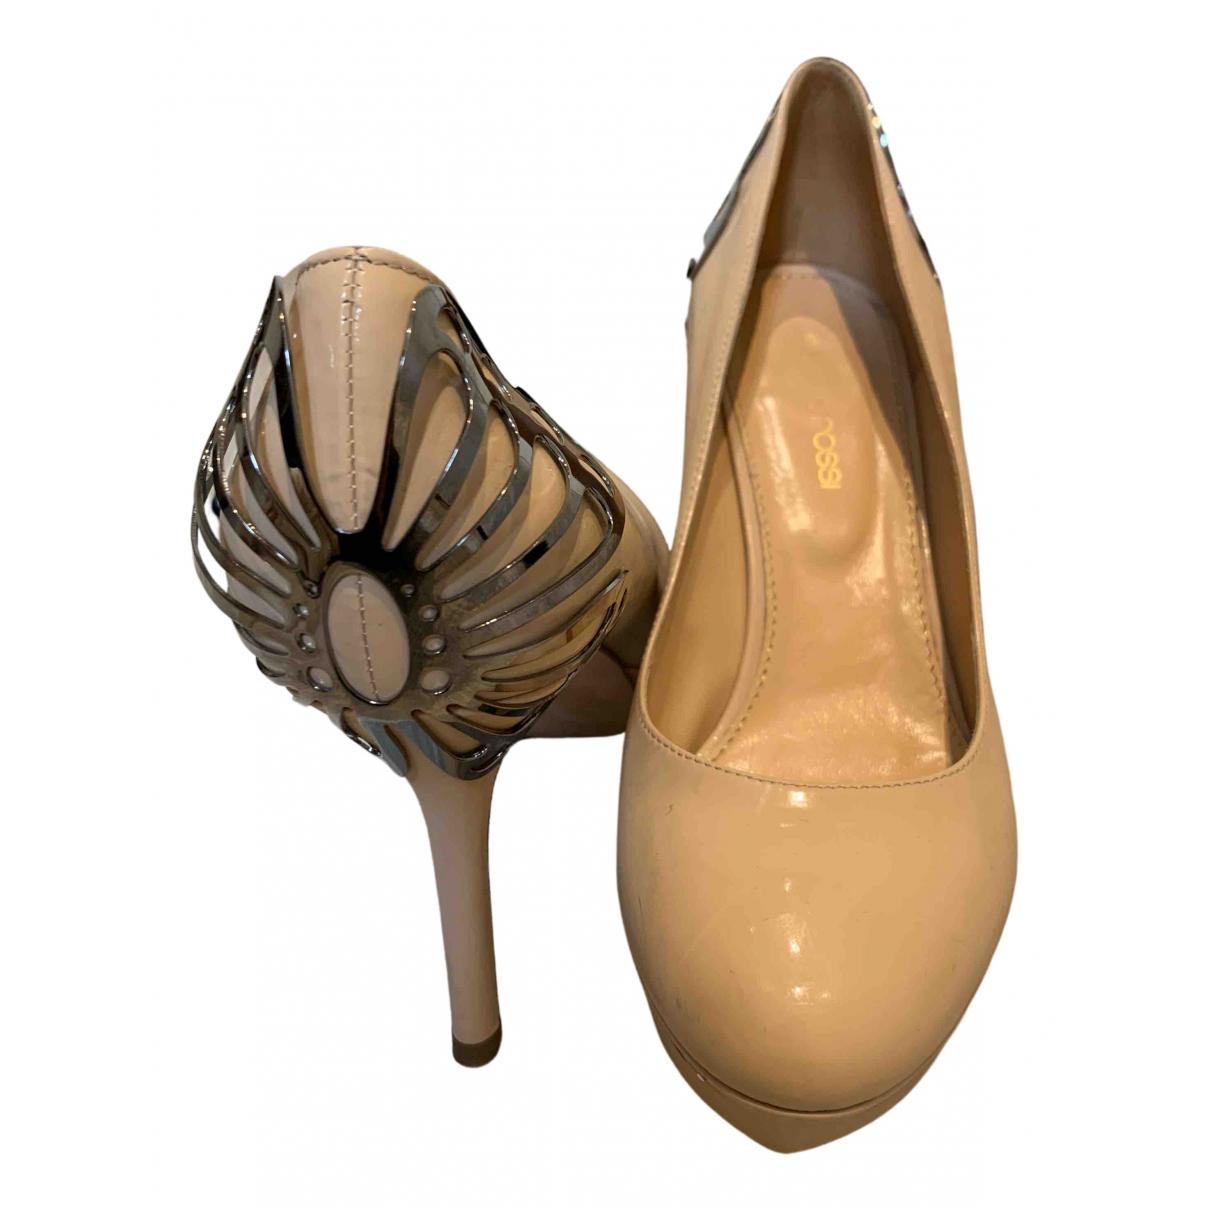 Sergio Rossi N Beige Patent leather Heels for Women 36.5 EU